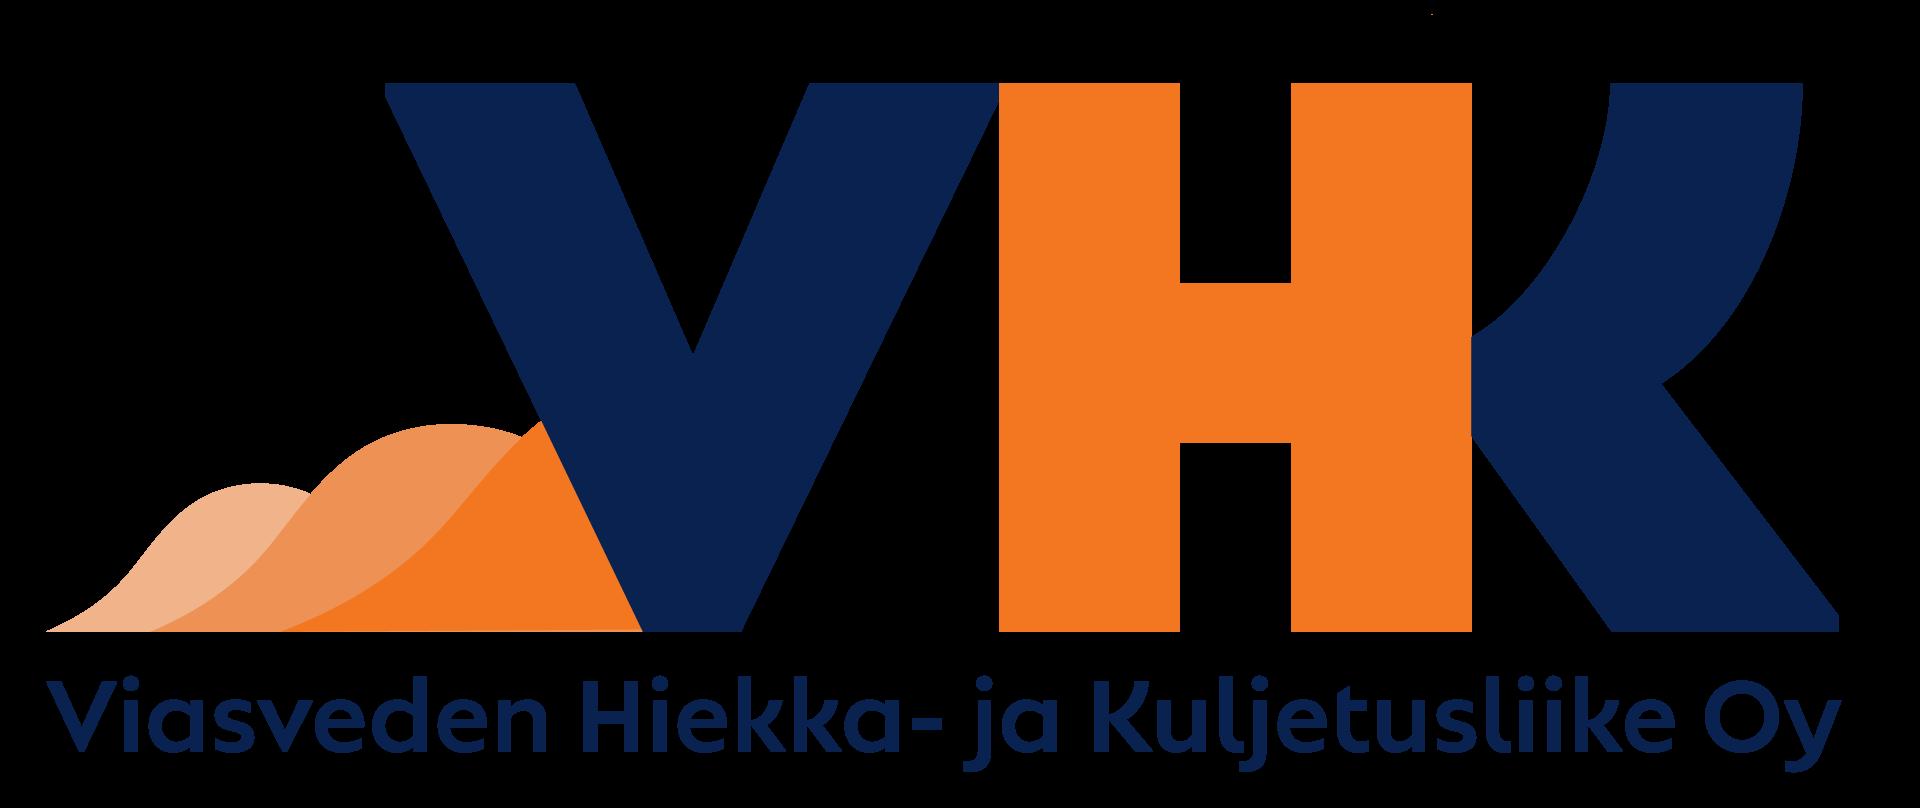 logo taustalle